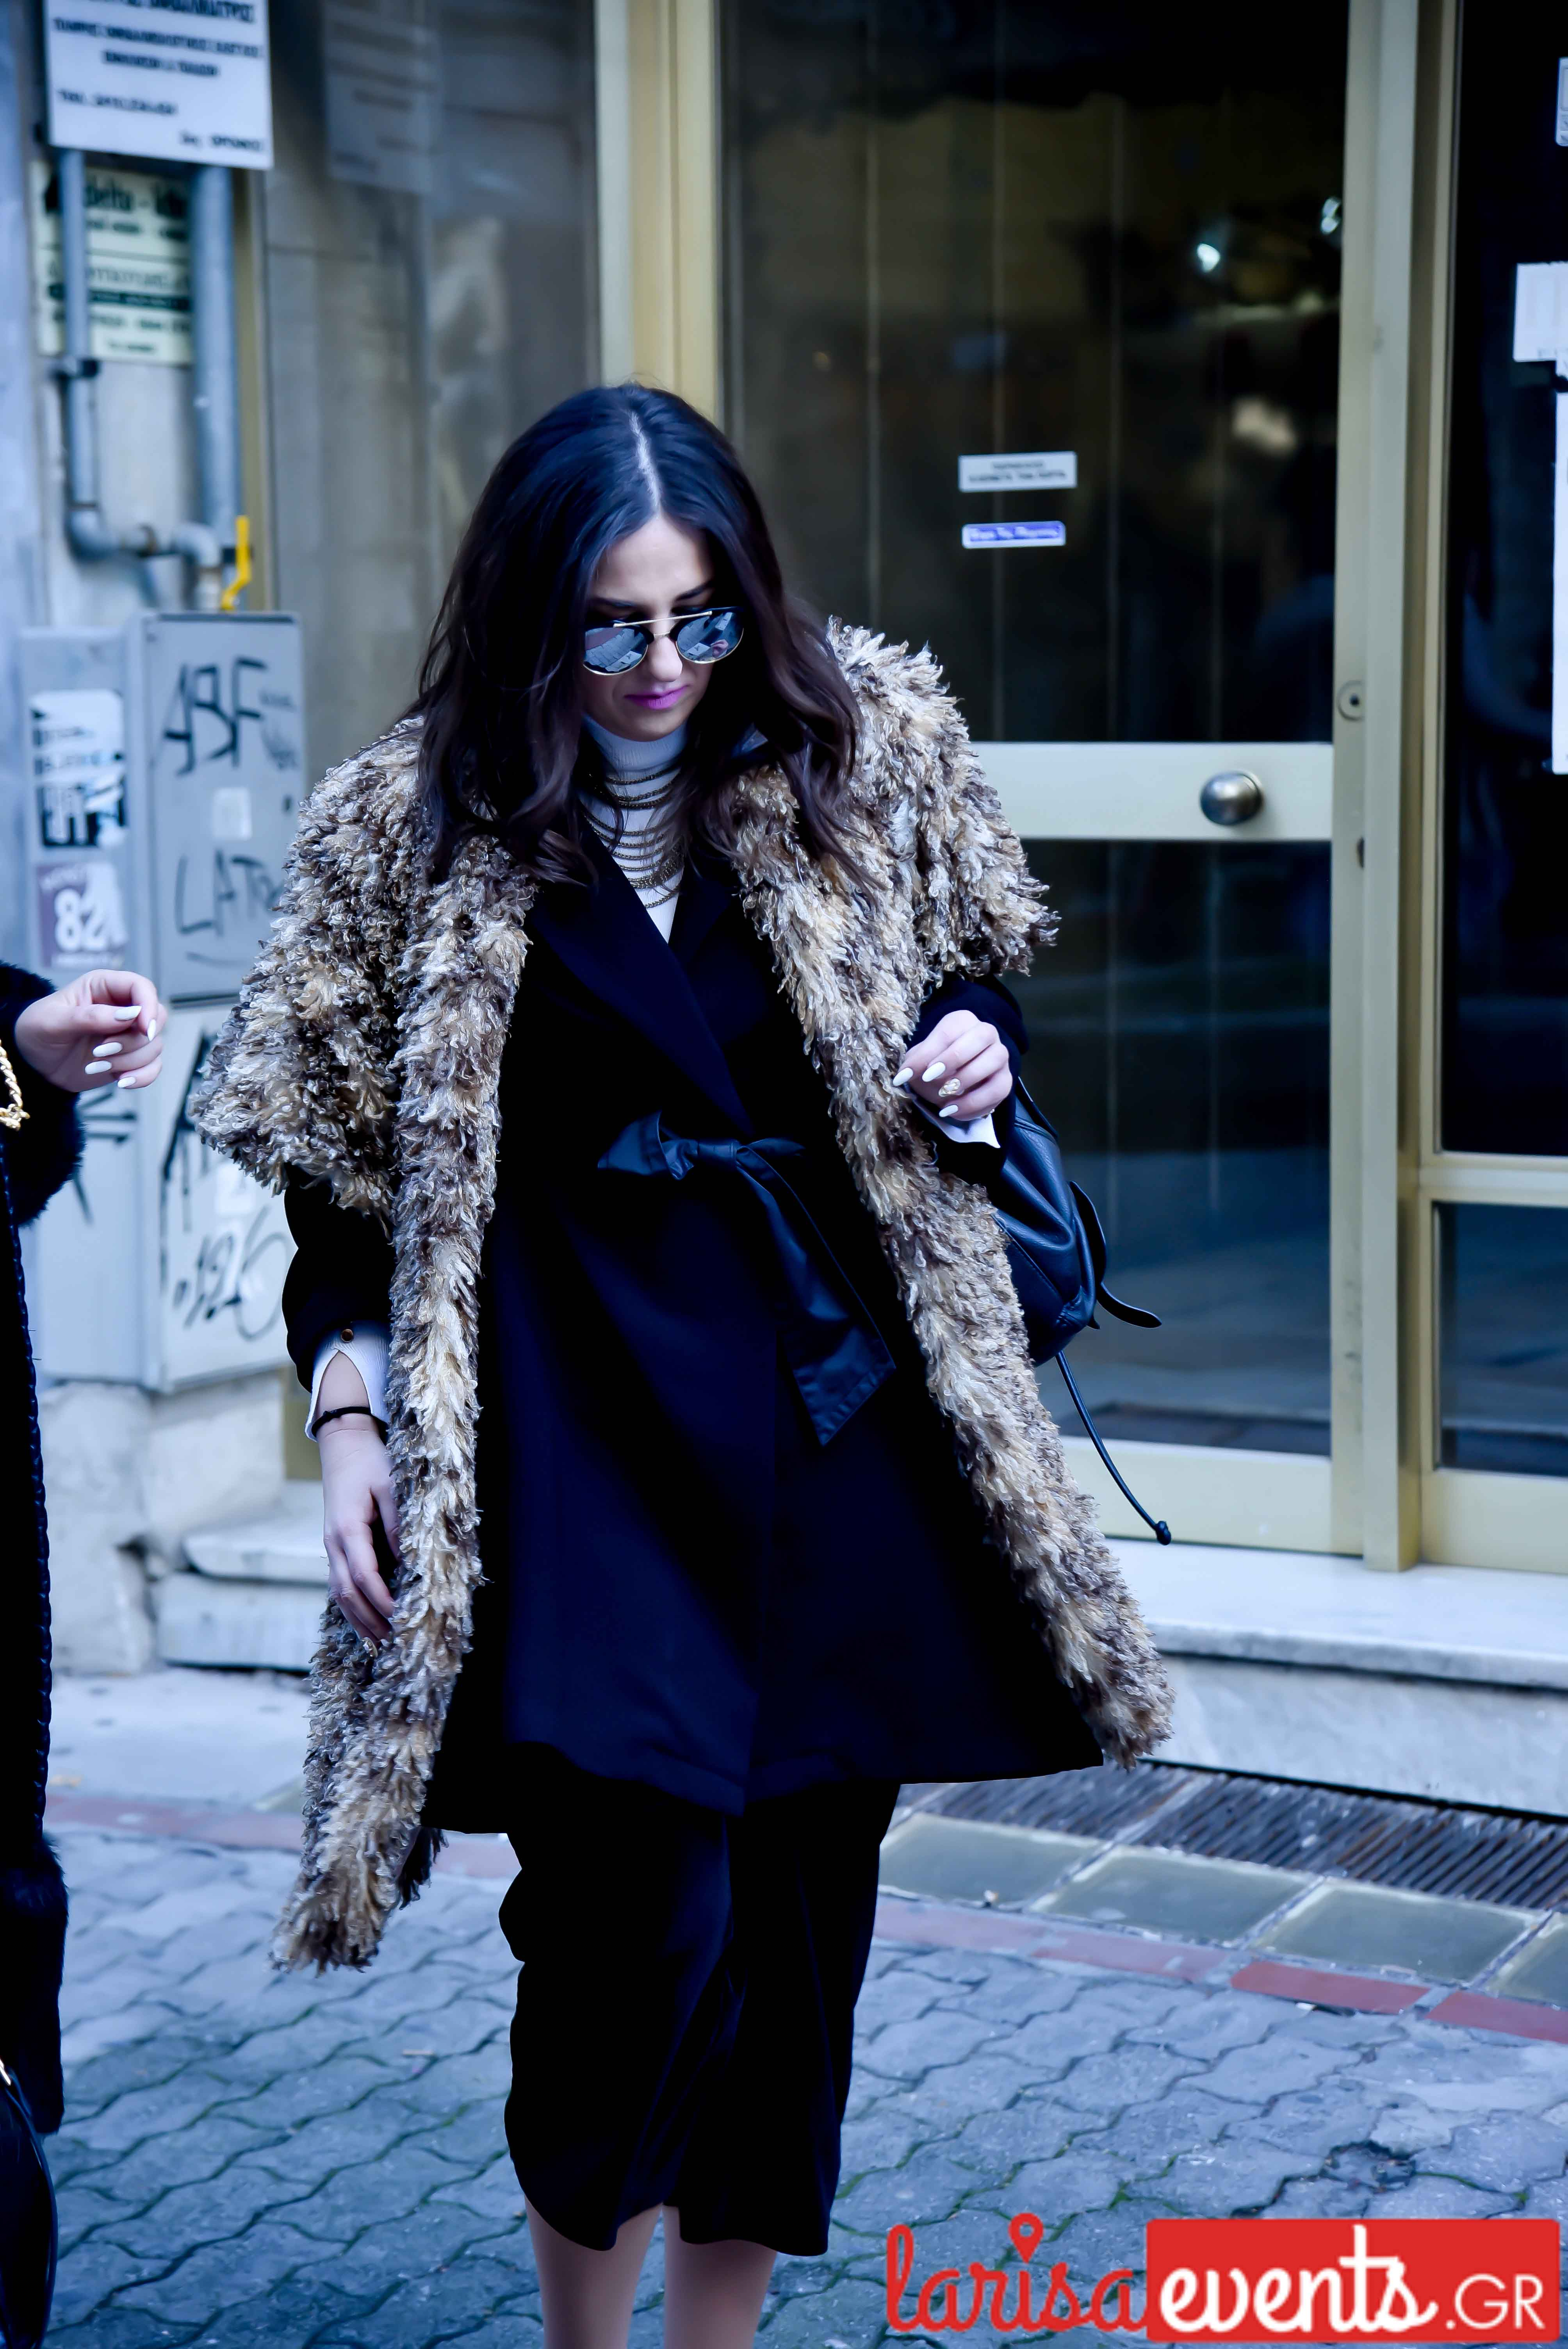 LAZ 7345 - Λάρισα's Street Style | Οι γυναίκες της πόλης σε street style clicks!